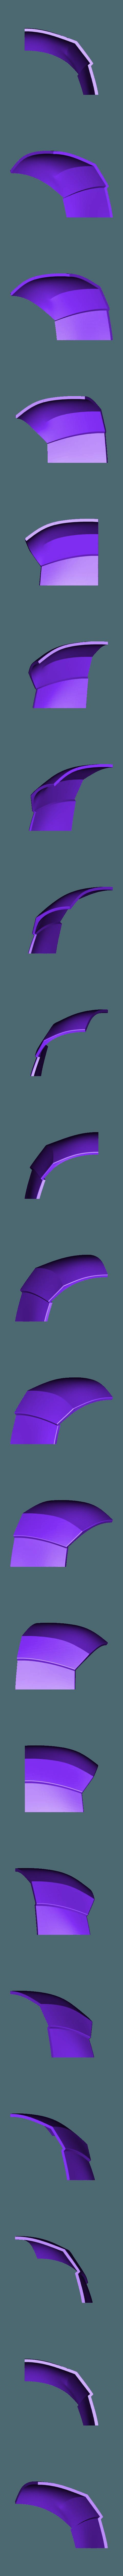 part 5.stl Download STL file Deathstroke Injustice Helmet • 3D printable model, VillainousPropShop